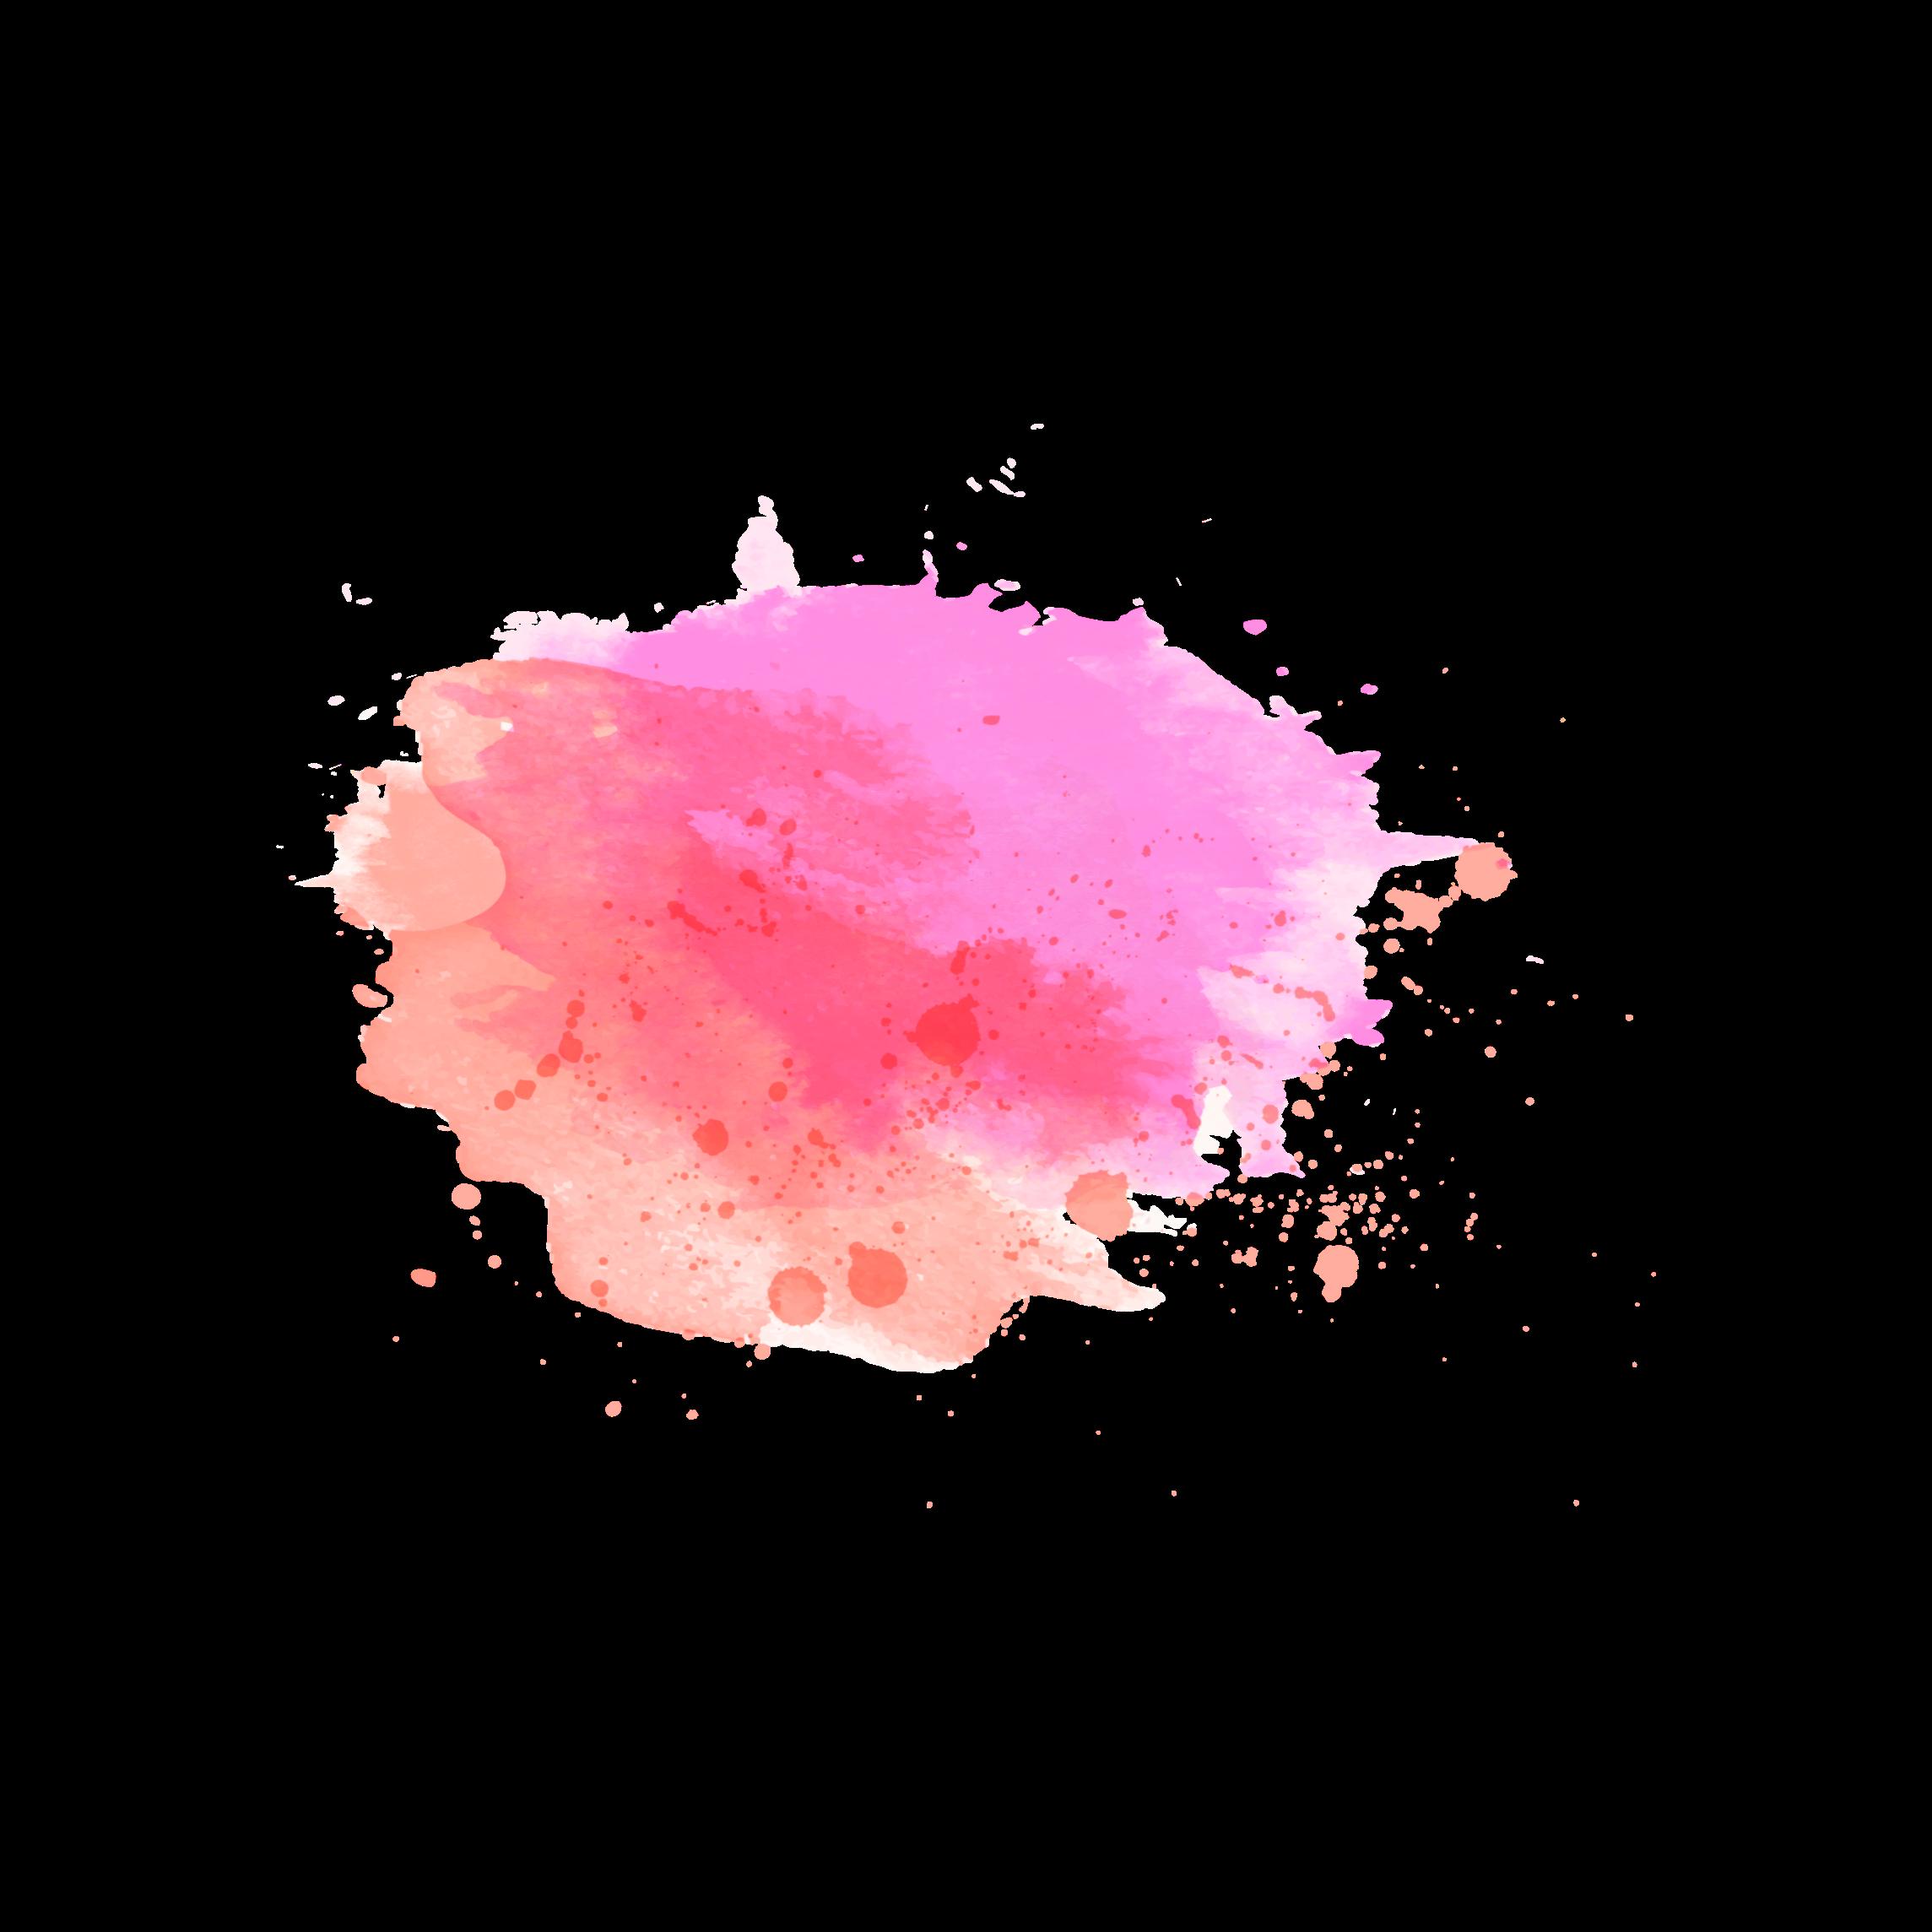 Freetoedit Mancha Rosa Remixed From 4asno4i Watercolor Splash Watercolor Splash Png Sunset Painting